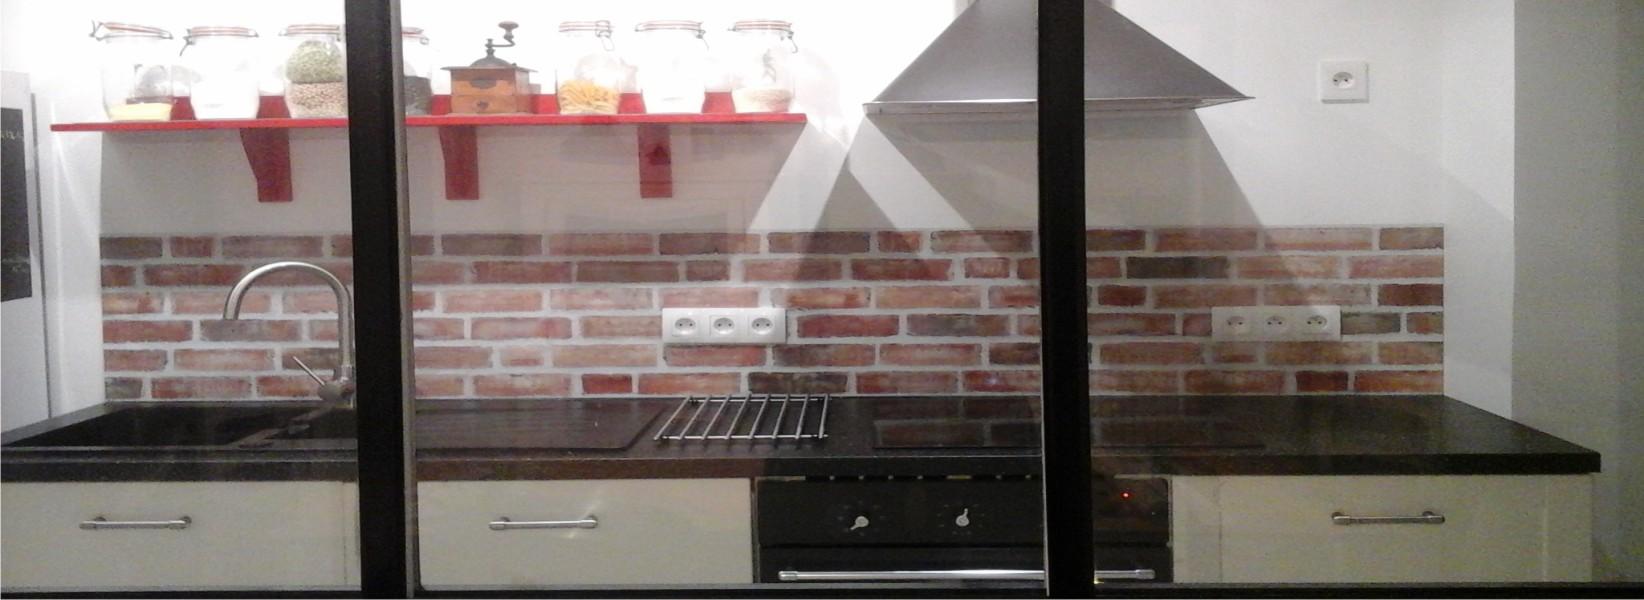 Panneau credence cuisine credence crdence murale de - Panneau credence cuisine ...